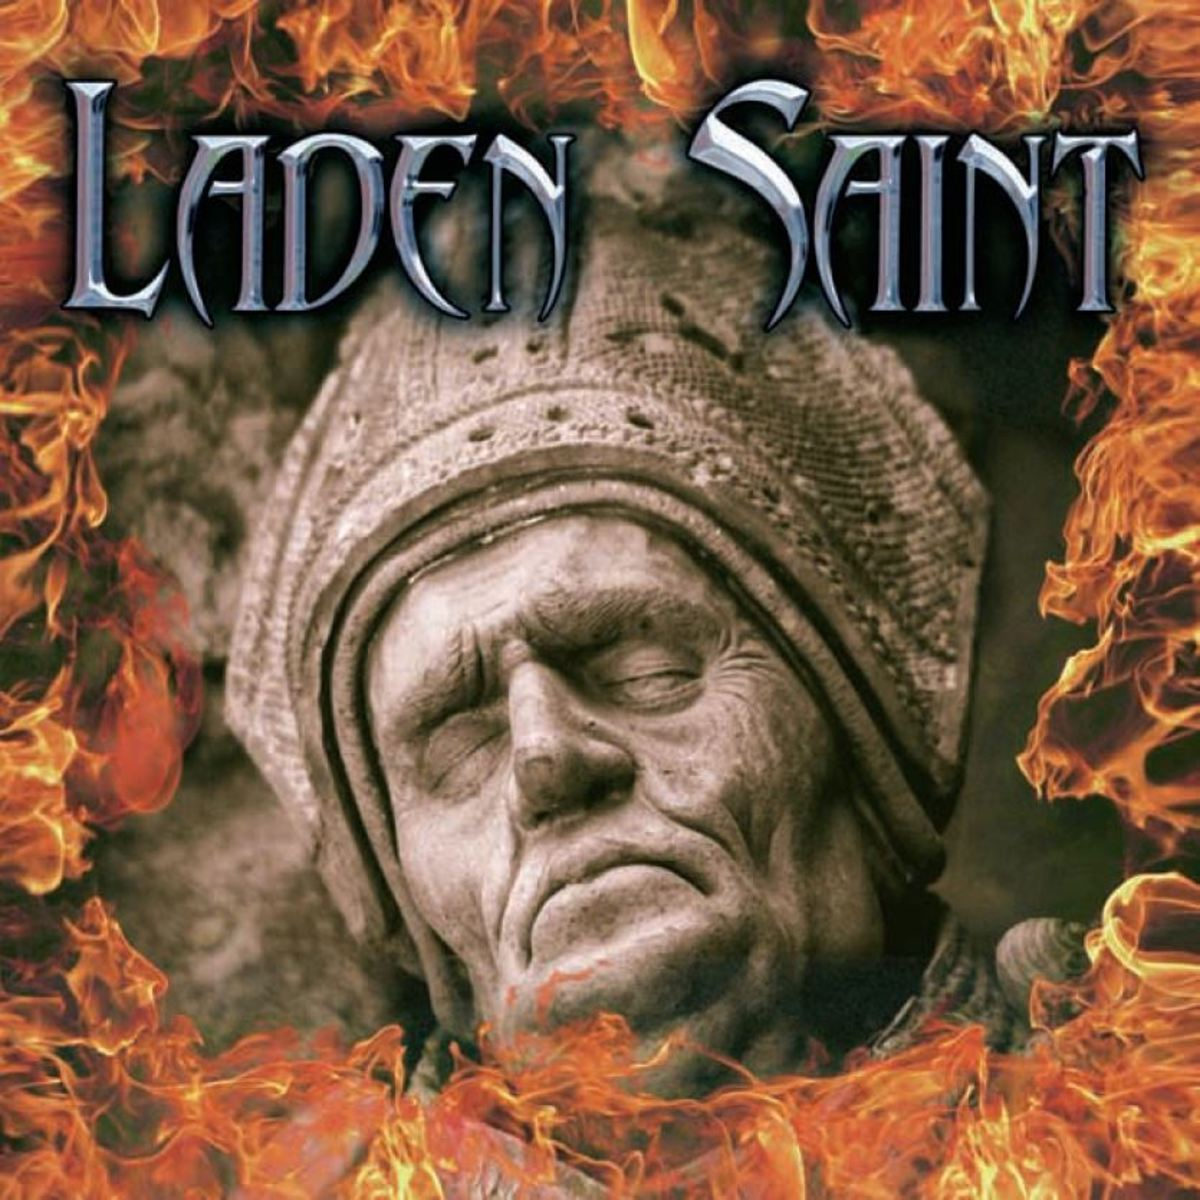 """Laden Saint"" CD cover"